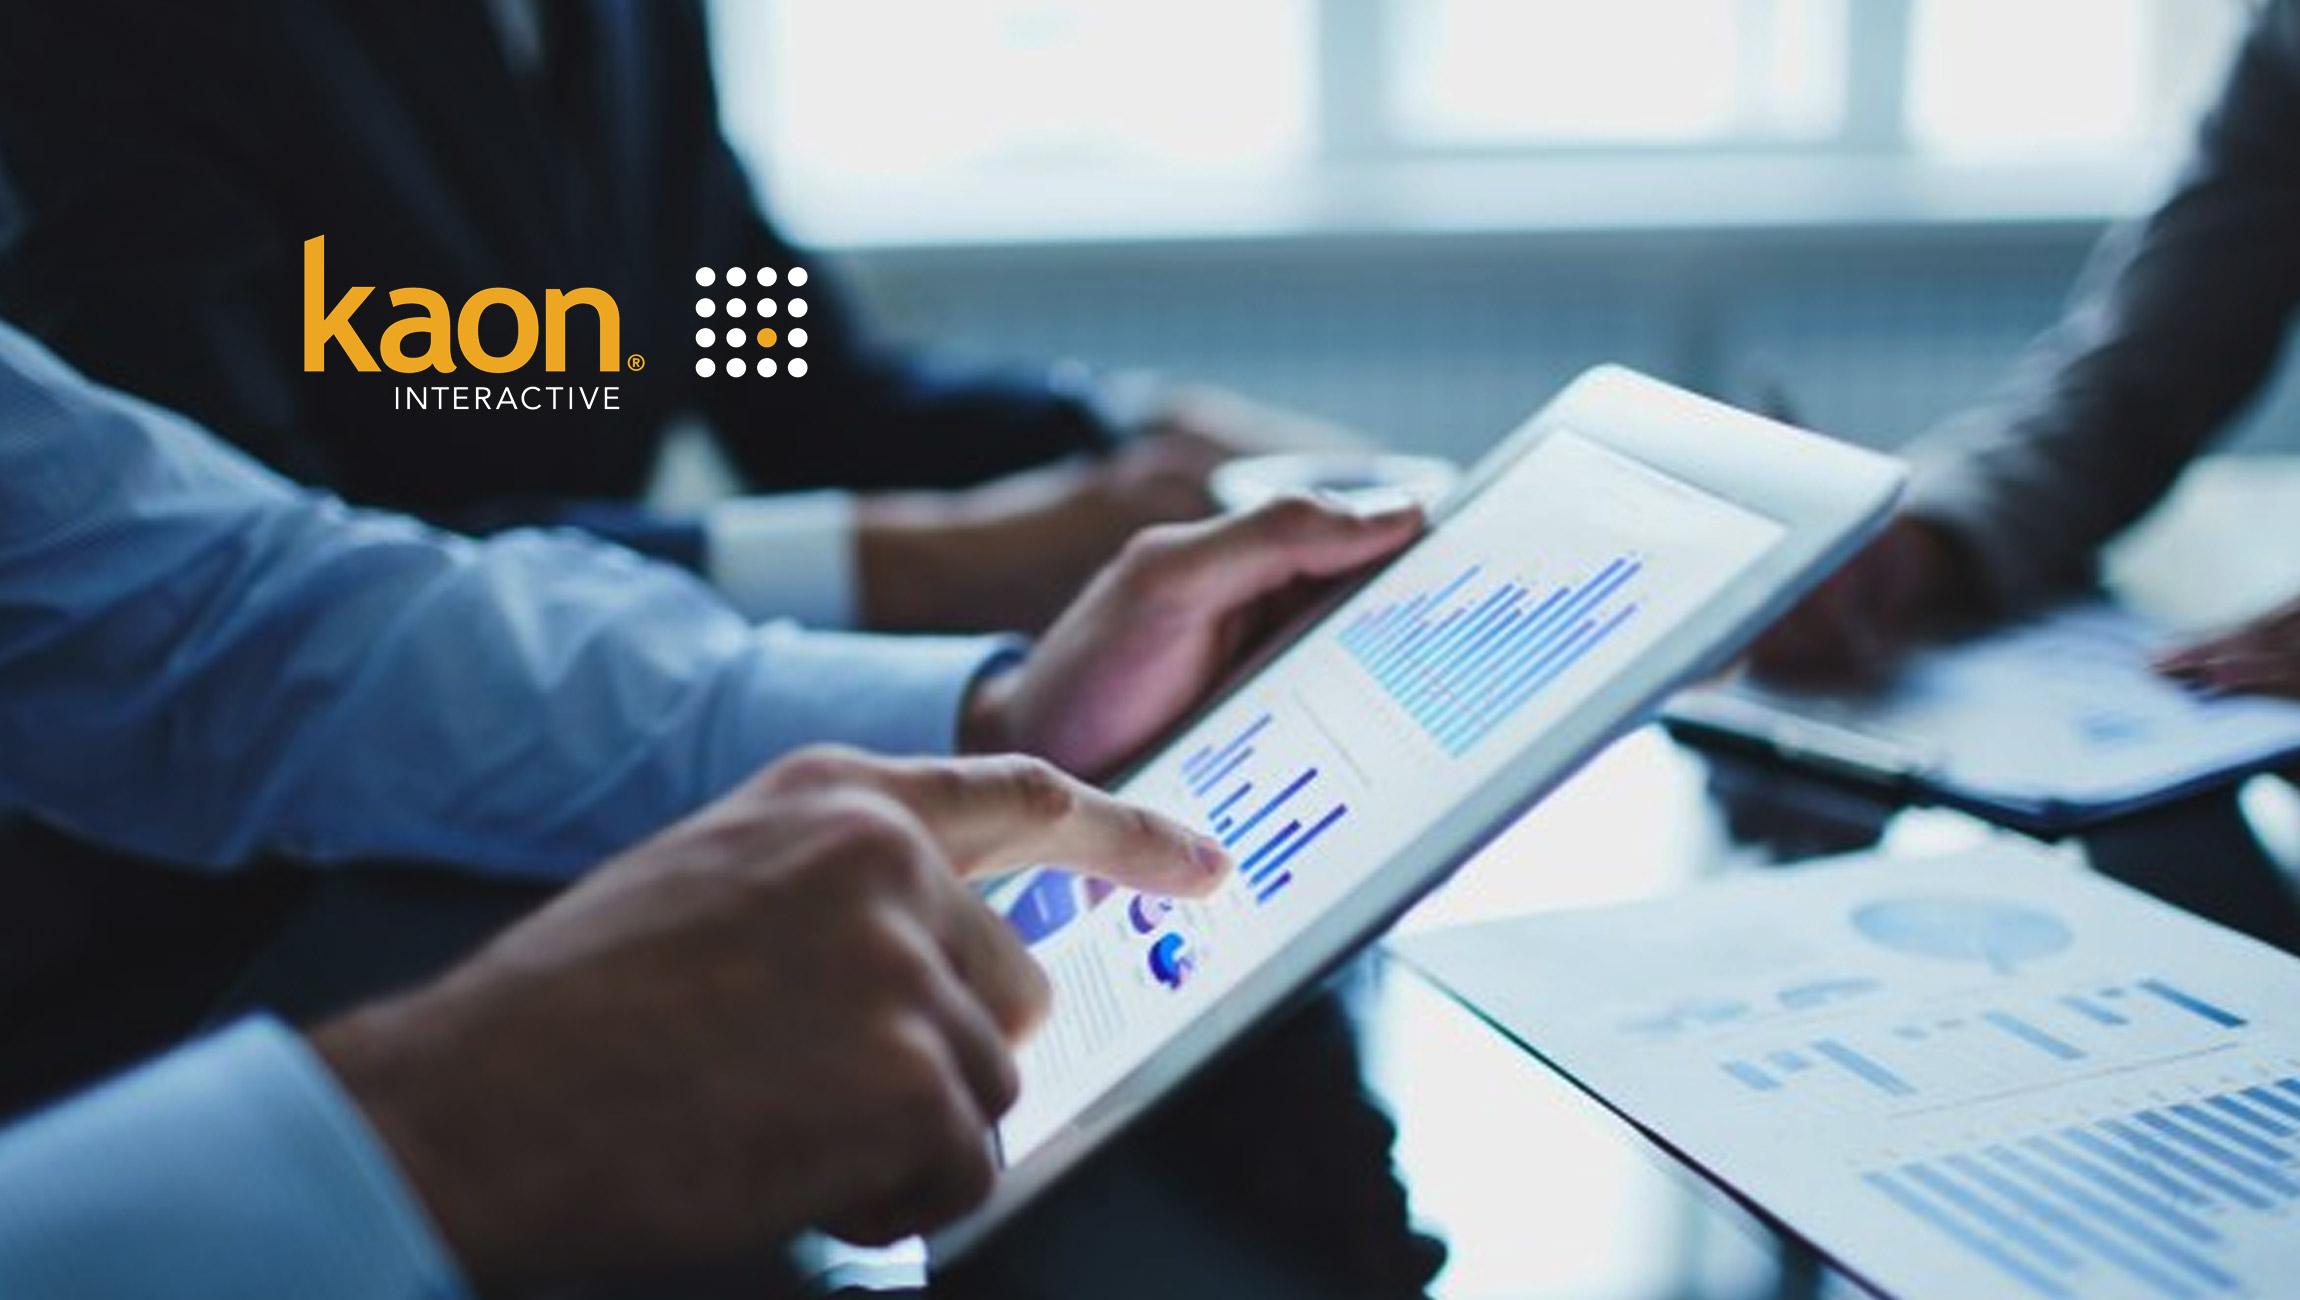 Kaon Interactive Adds Five Multi-Billion-Dollar Revenue Clients to Its Enterprise Roster